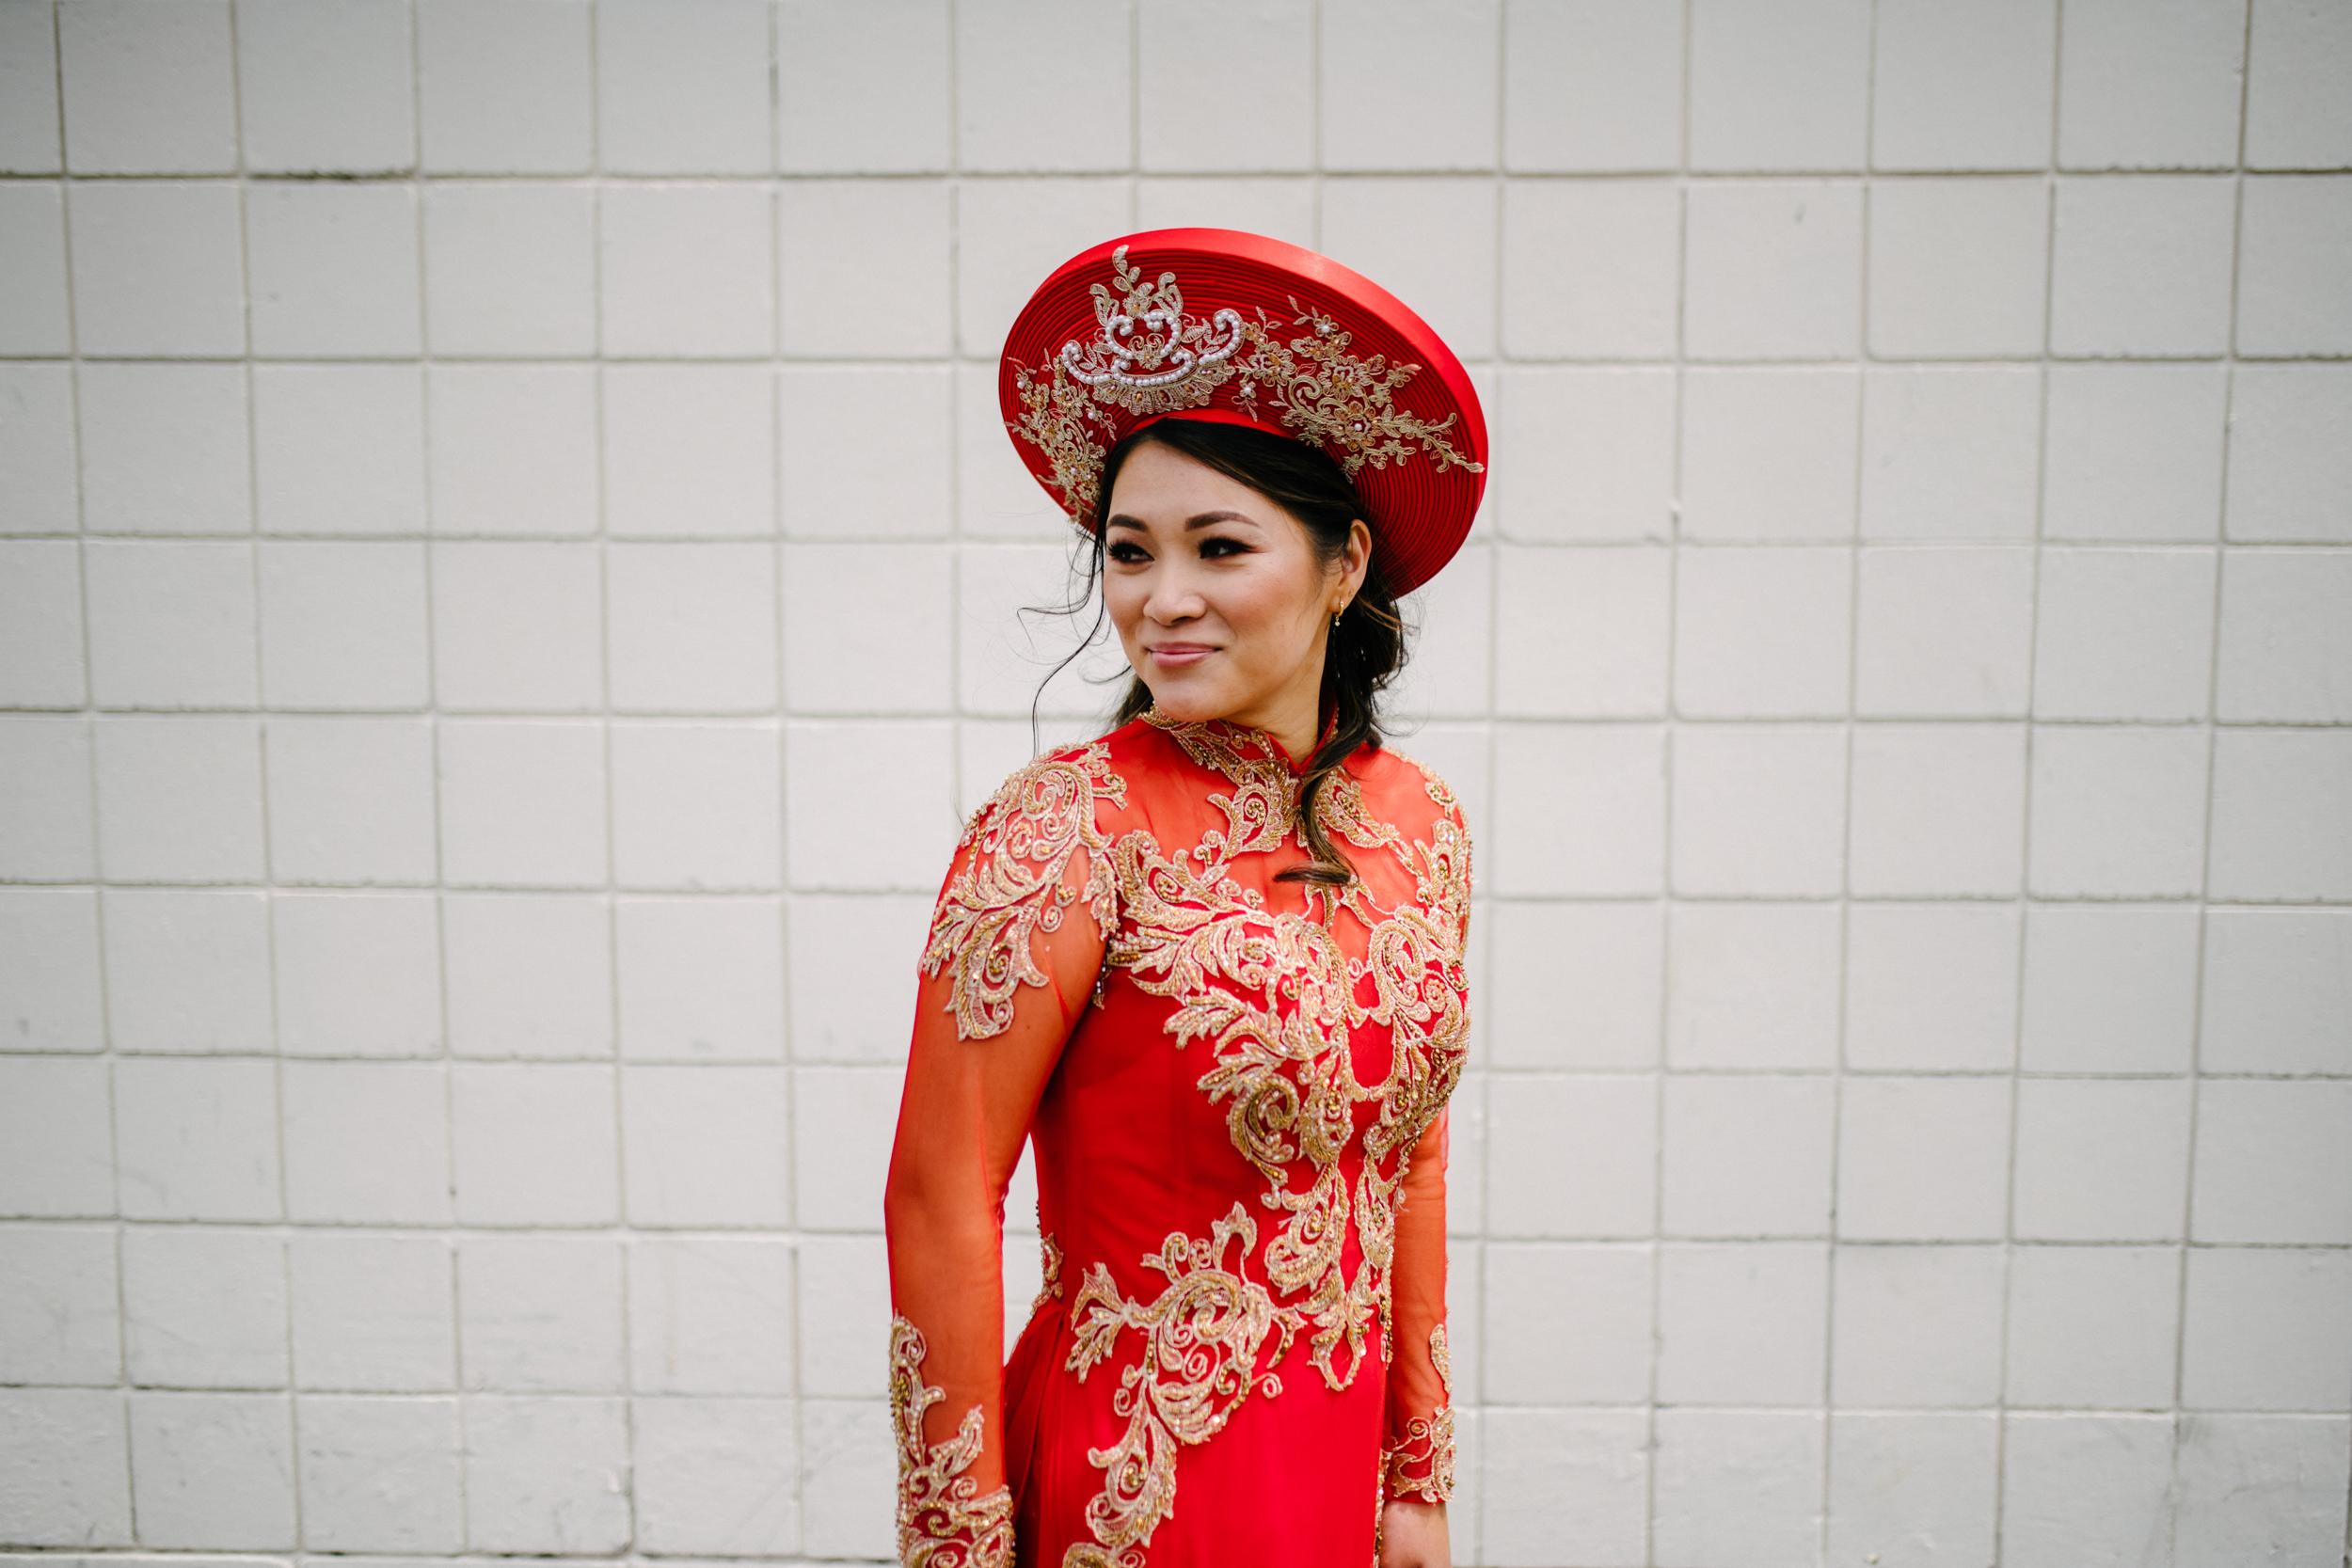 wedding_coronado_community_center-8.jpg